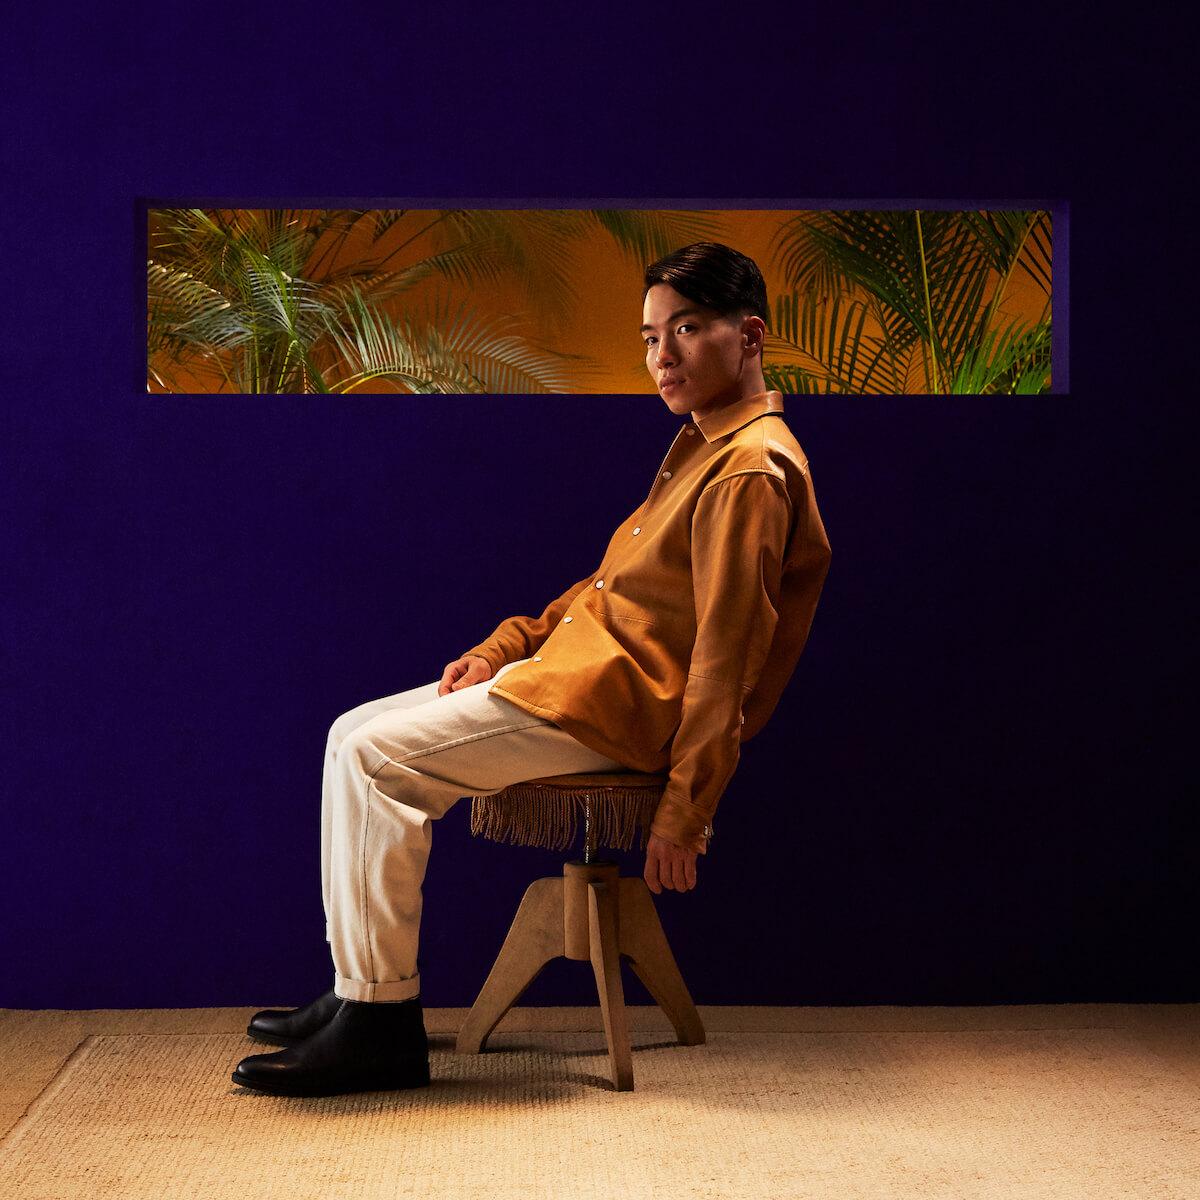 SIRUP、自身初のフルアルバム『FEEL GOOD』収録曲「PRAYER」新MV公開|アルバムにはBIM、TENDREが参加 music190531sirup-prayer_2